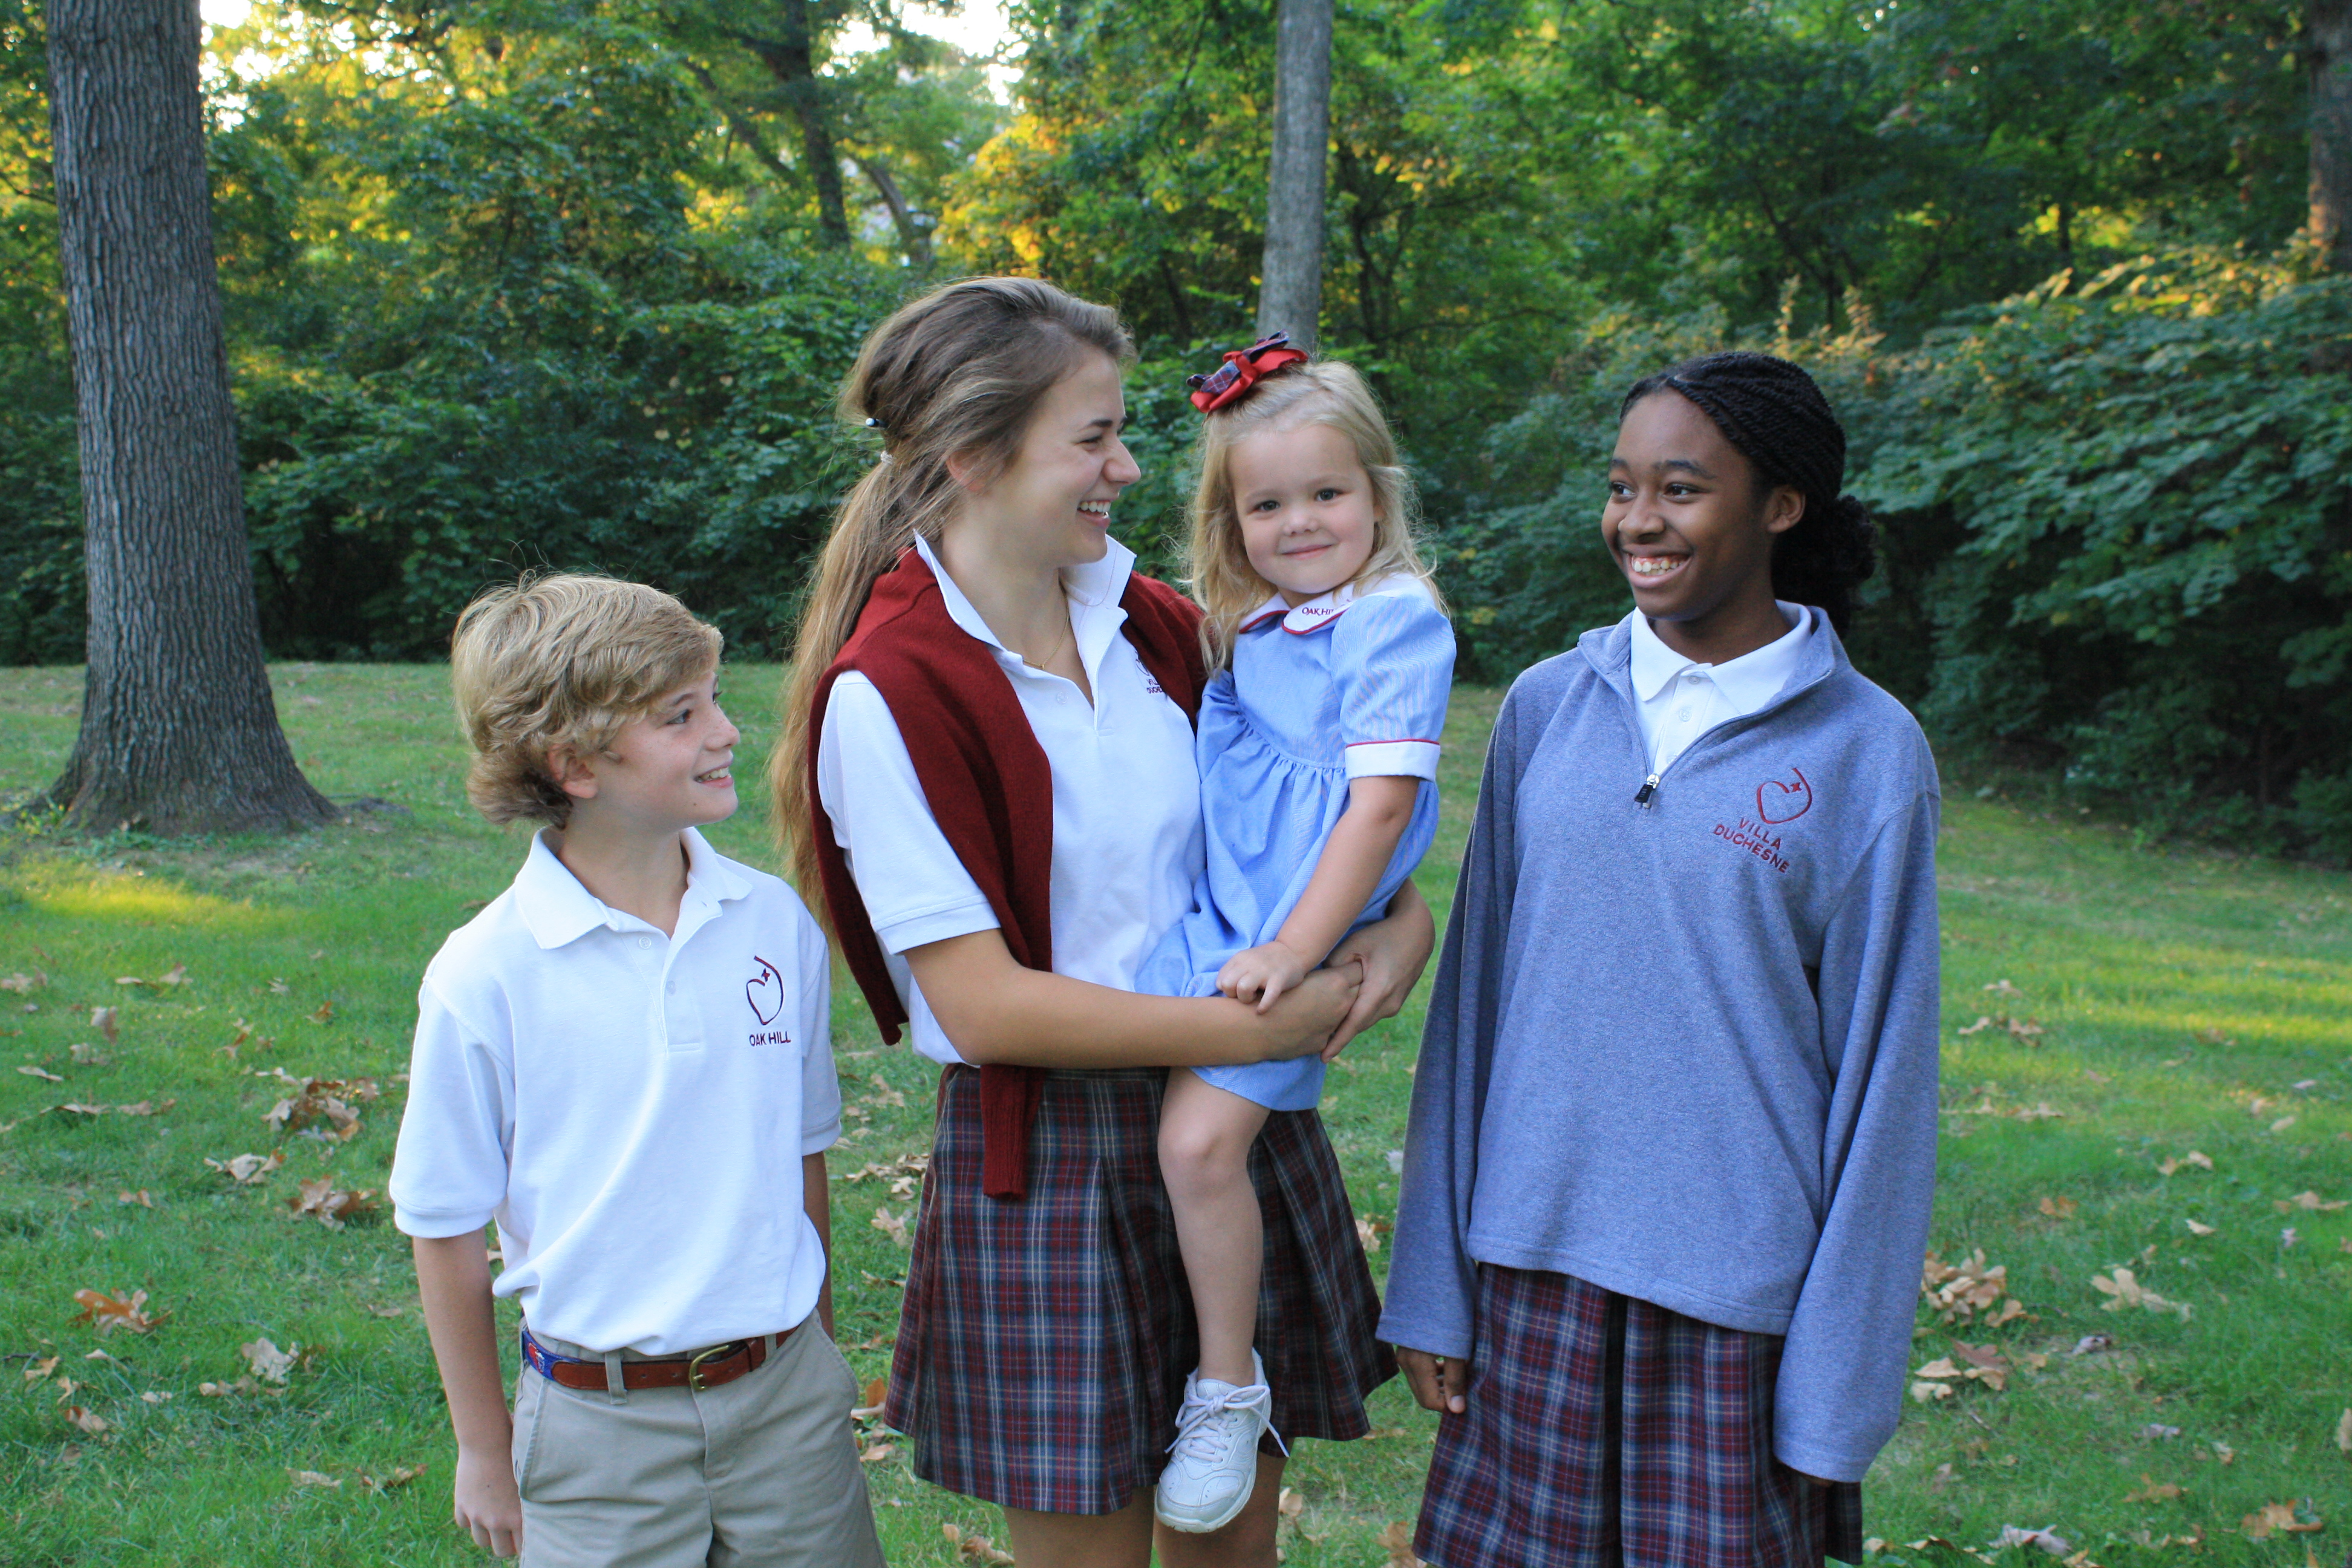 School - Villa Duchesne and Oak Hill School  1